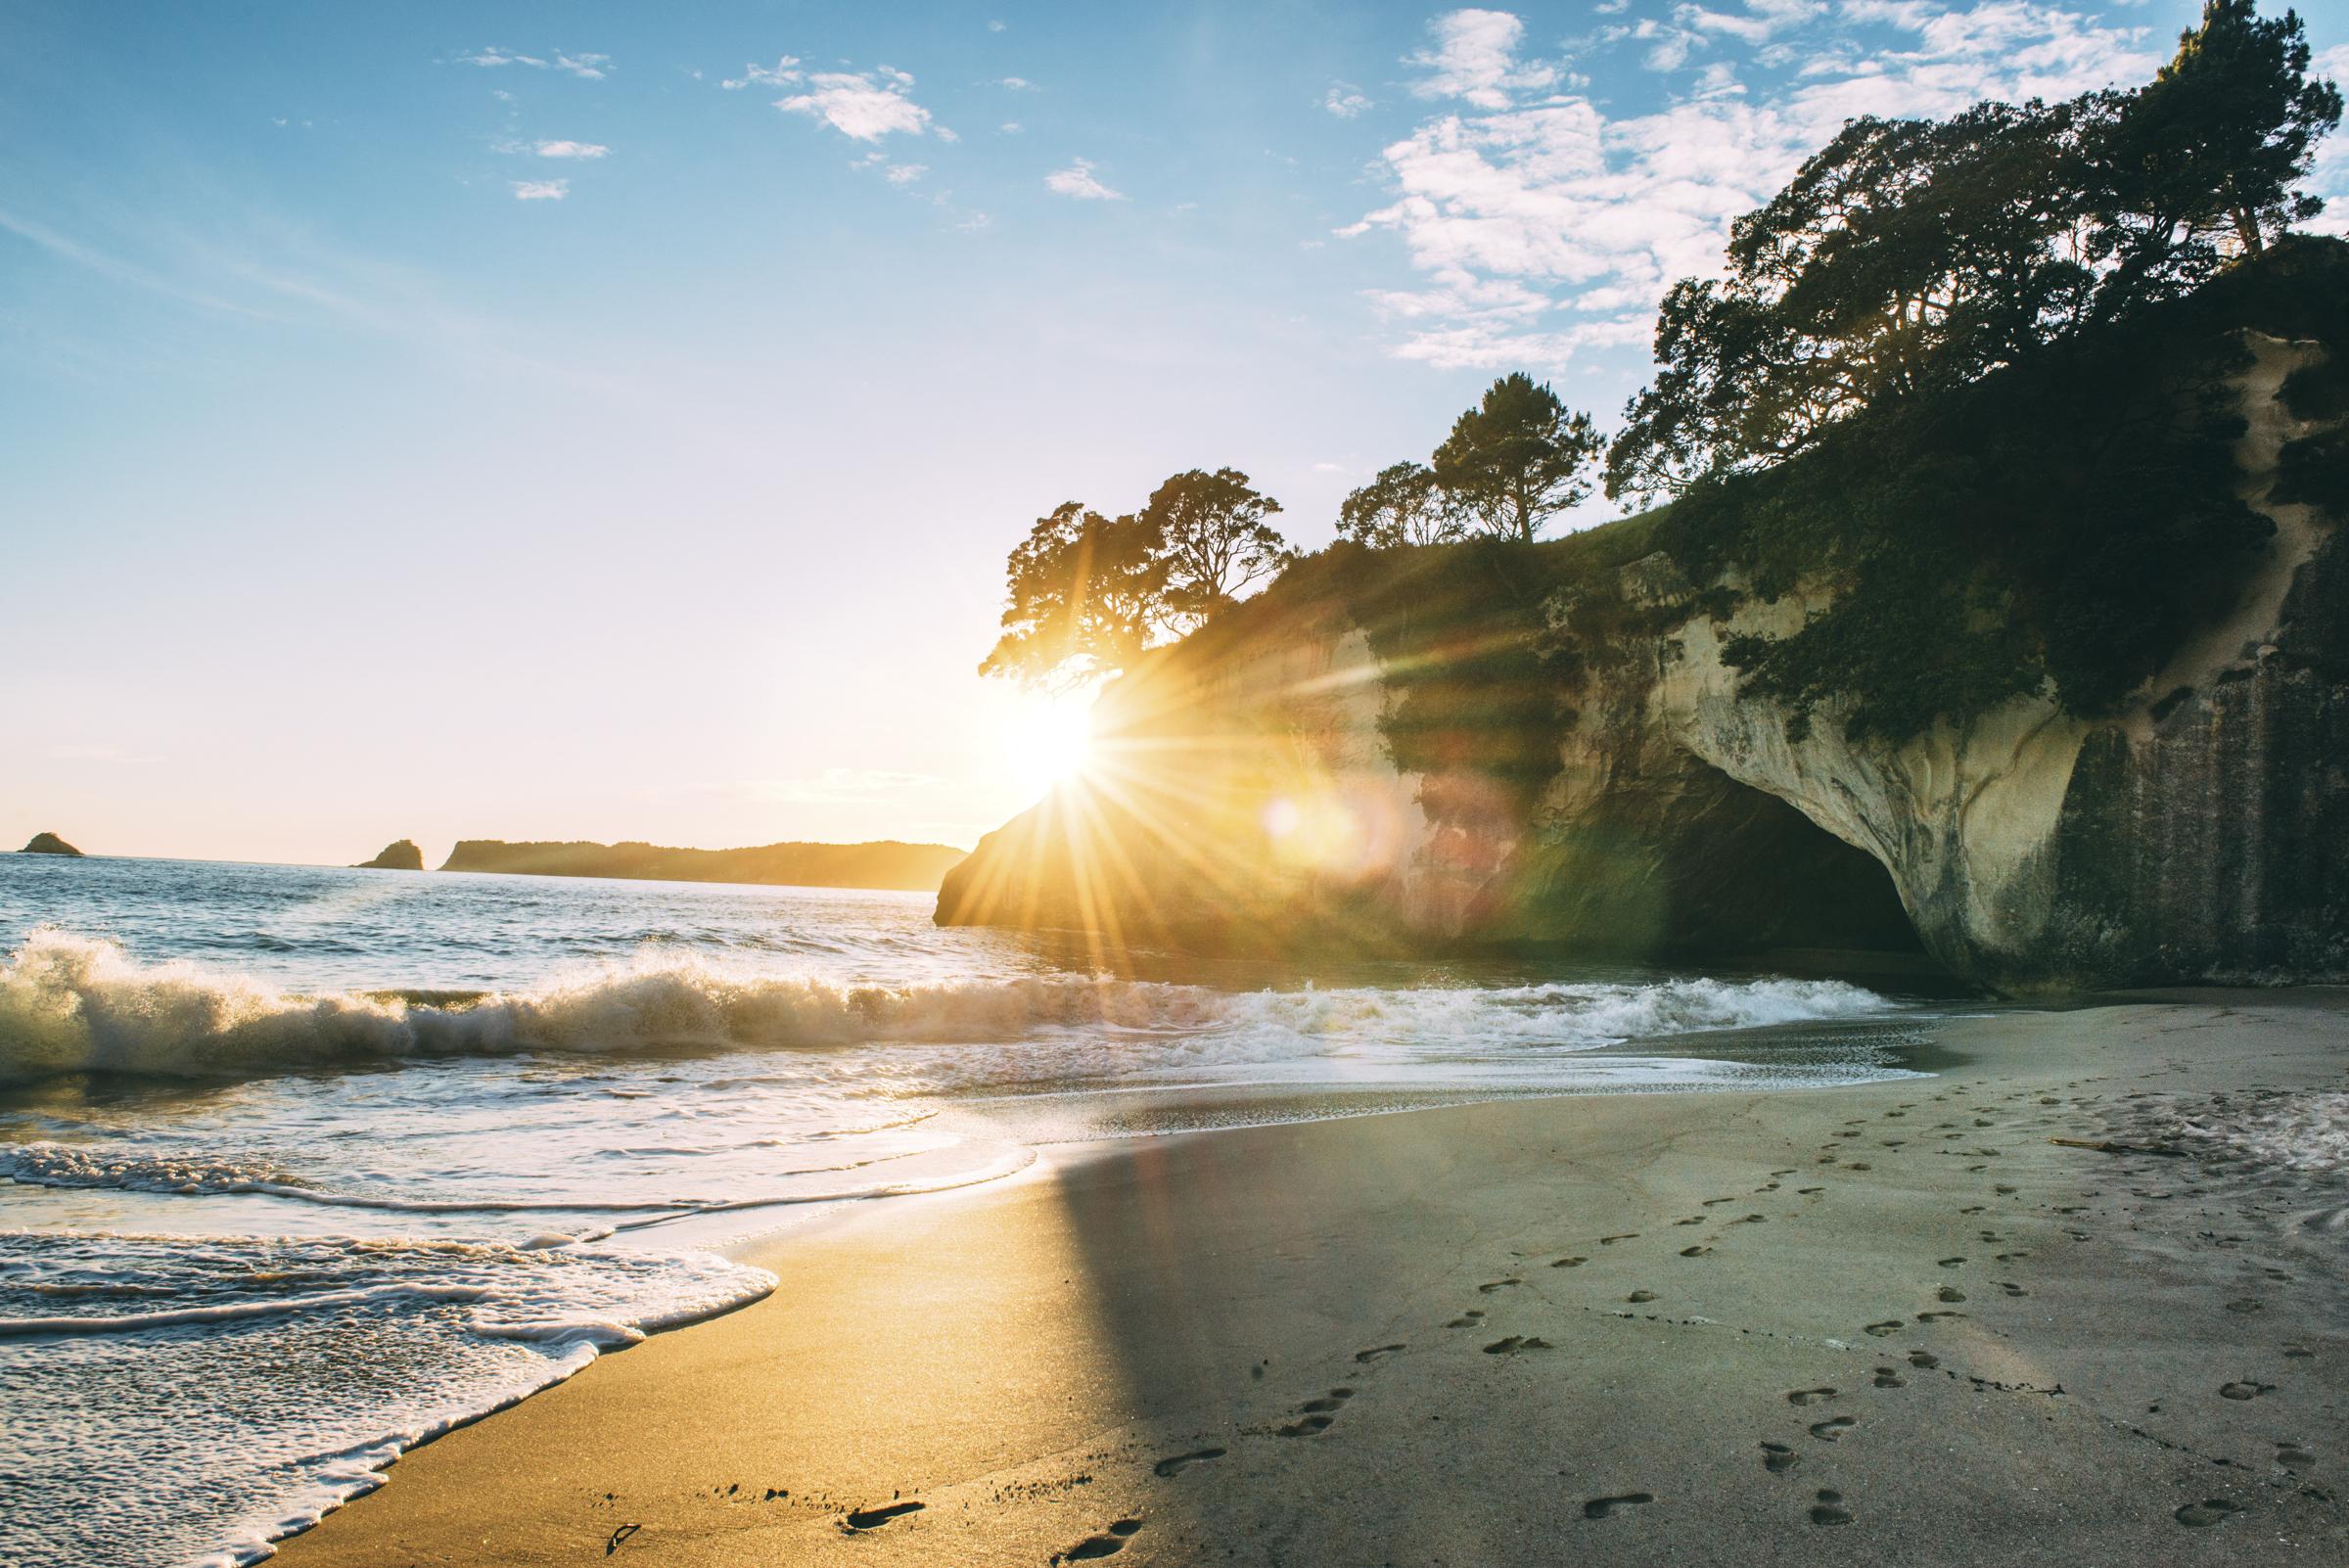 New Zealand Road Trip Lola Photography WEB_009.jpg